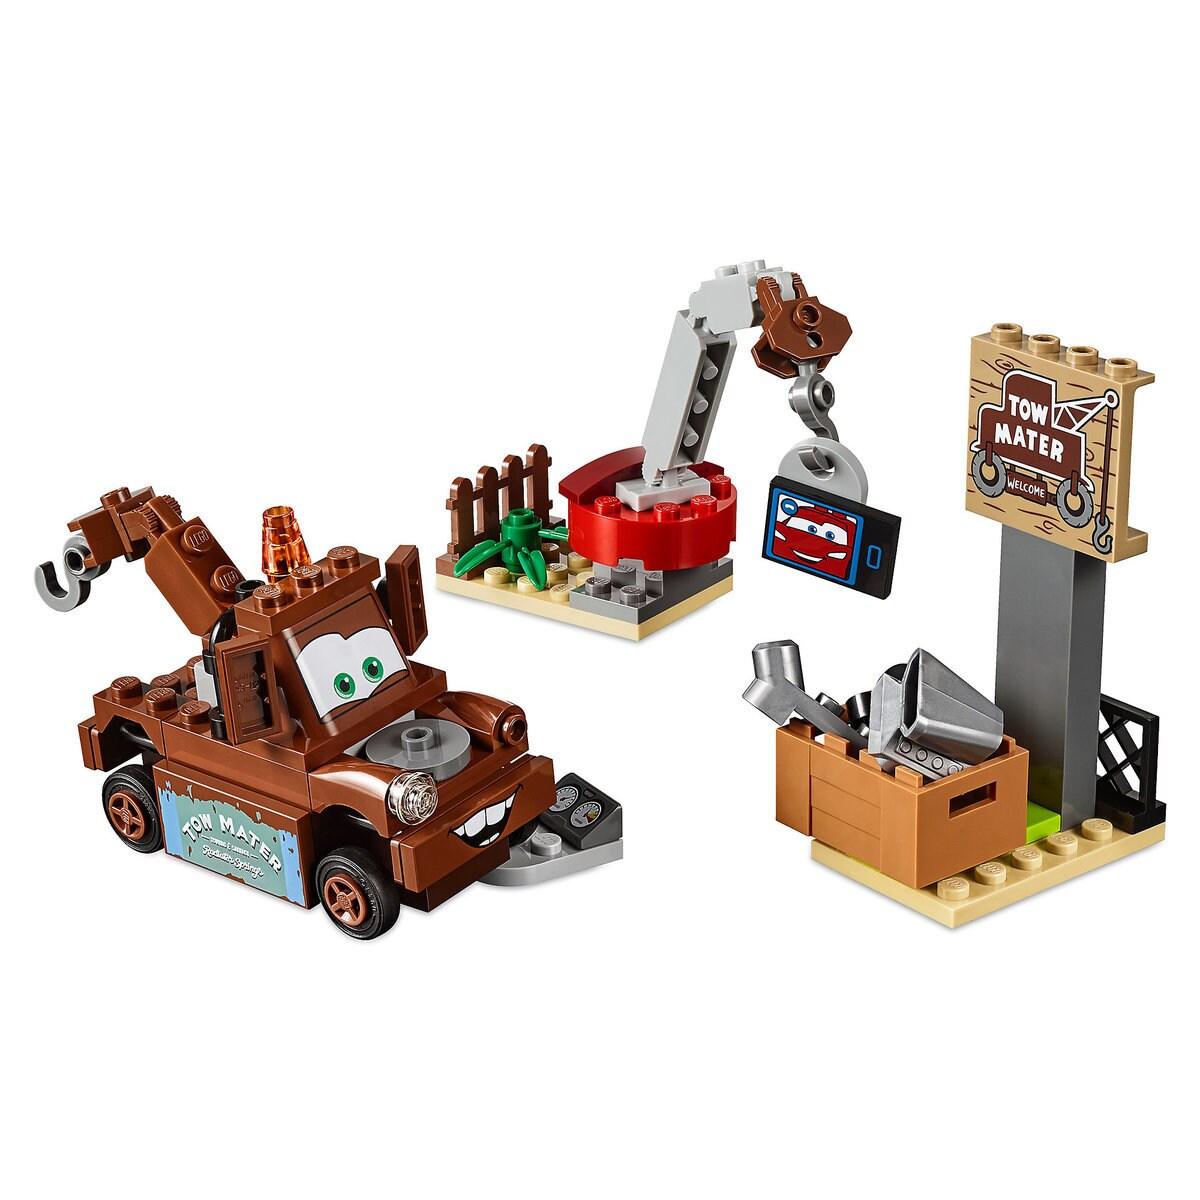 Mater S Junkyard Playset By Lego Juniors Cars 3 Shopdisney